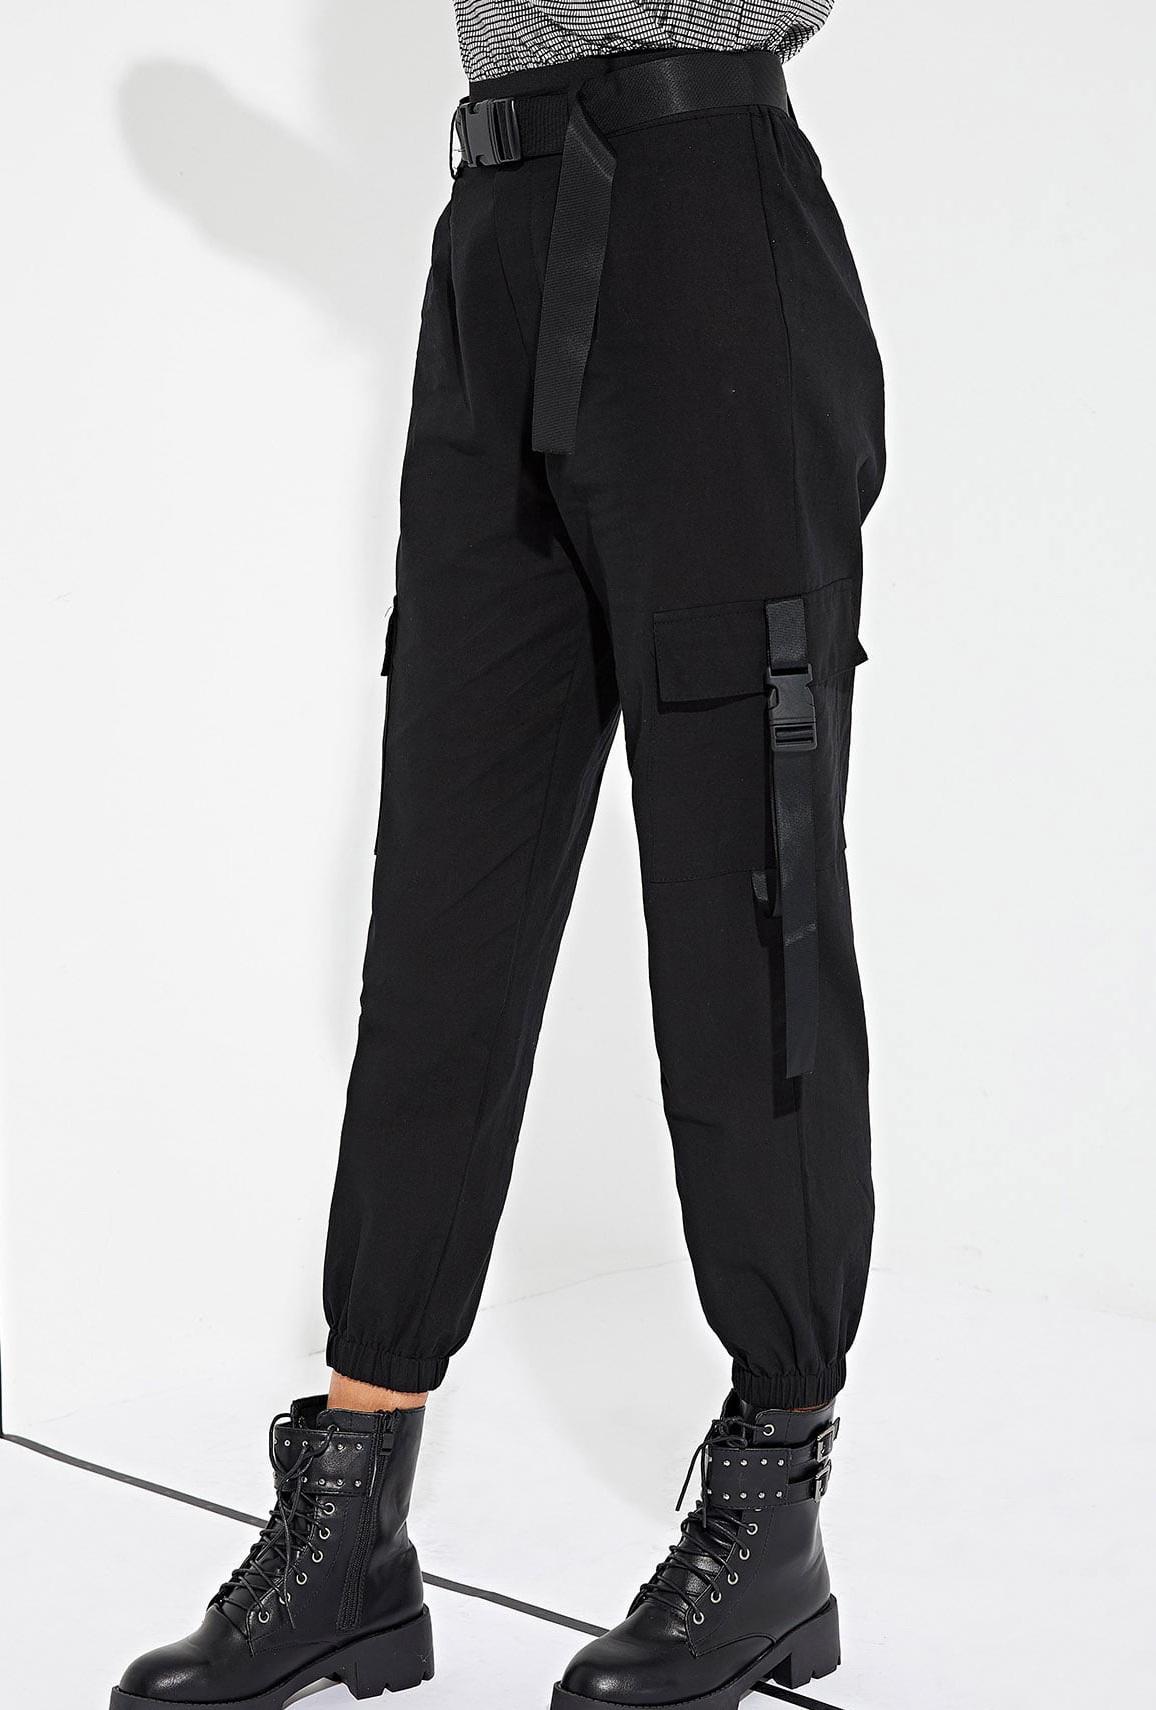 a3195aca pants girly girl girly wishlist black cargo pants buckles joggers joggers  pants trendy